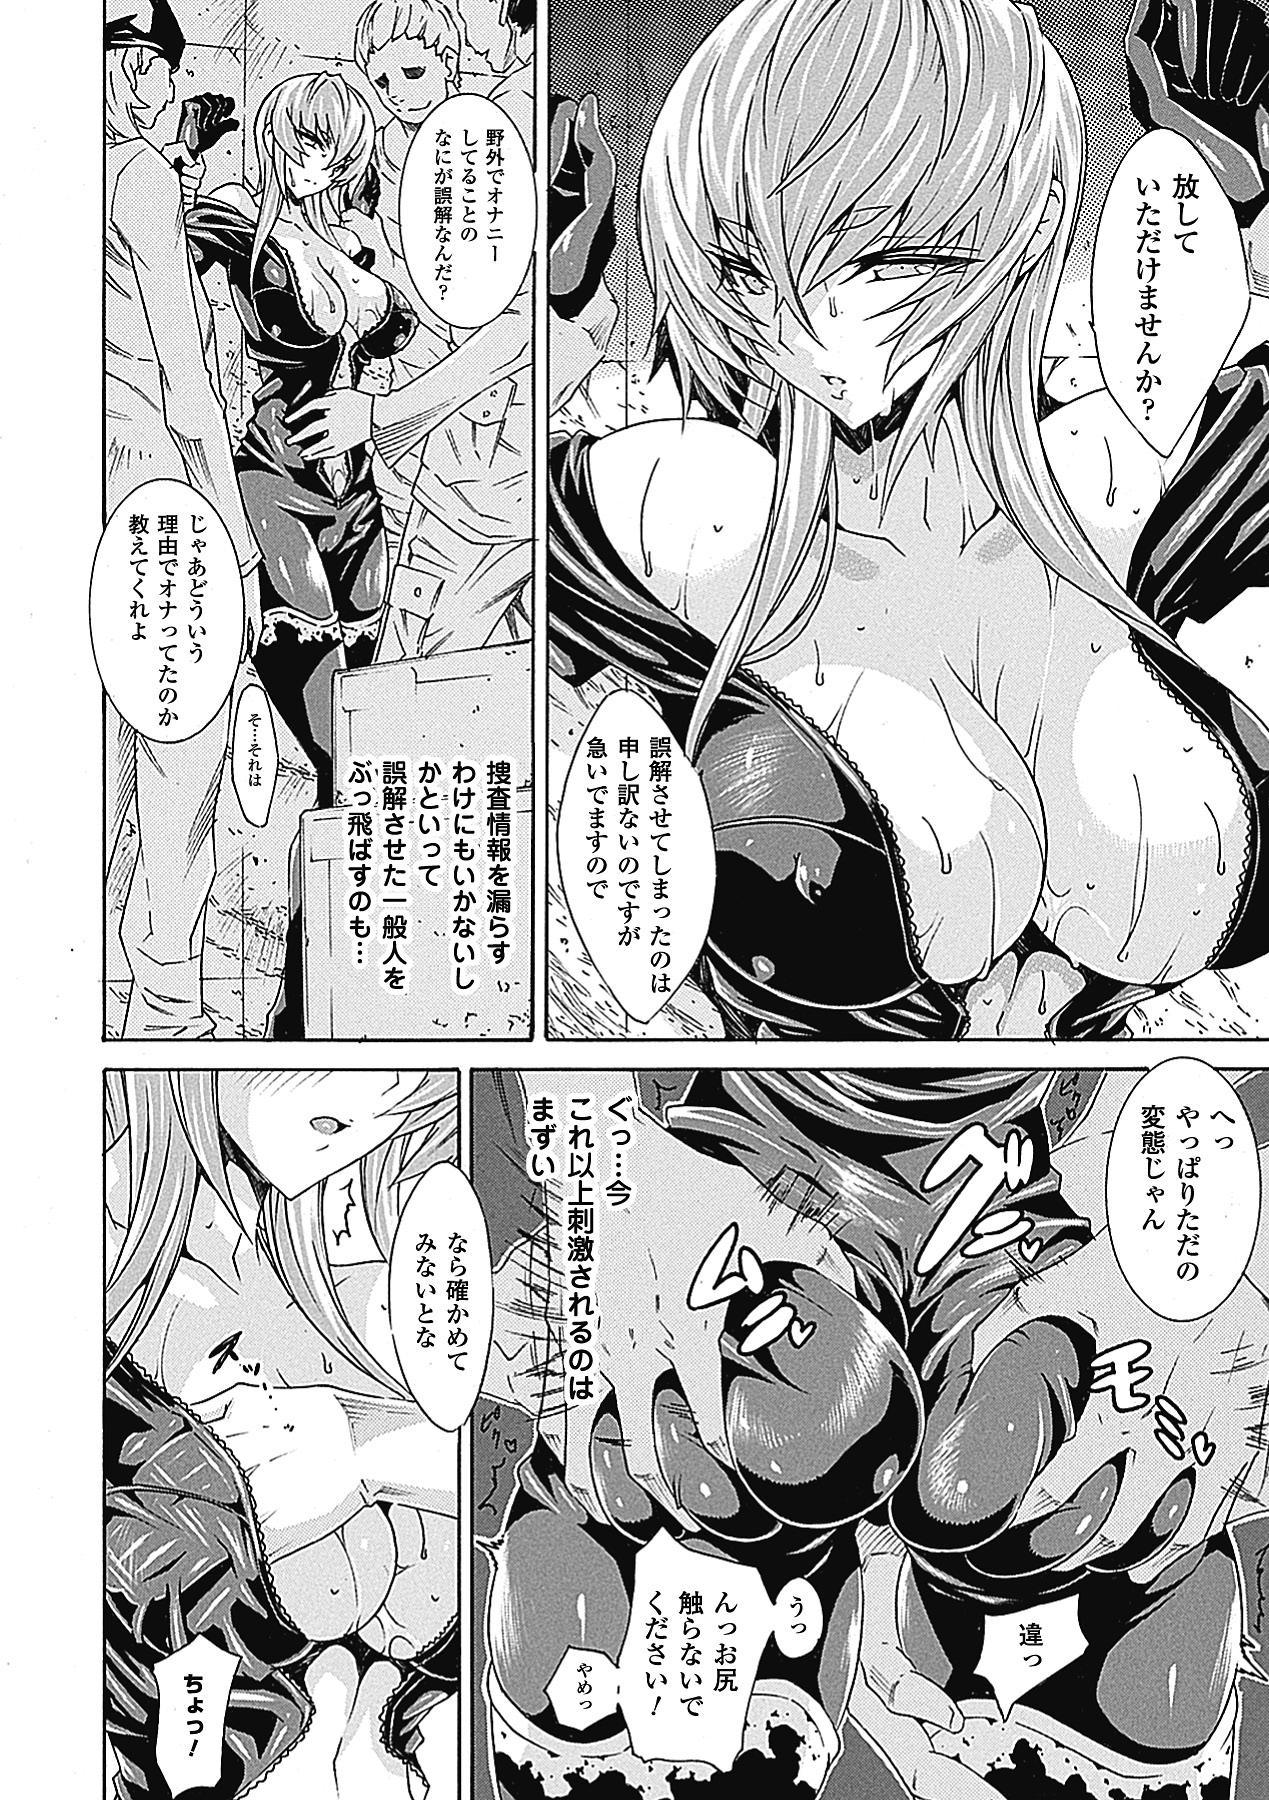 Megami Crisis 1 78